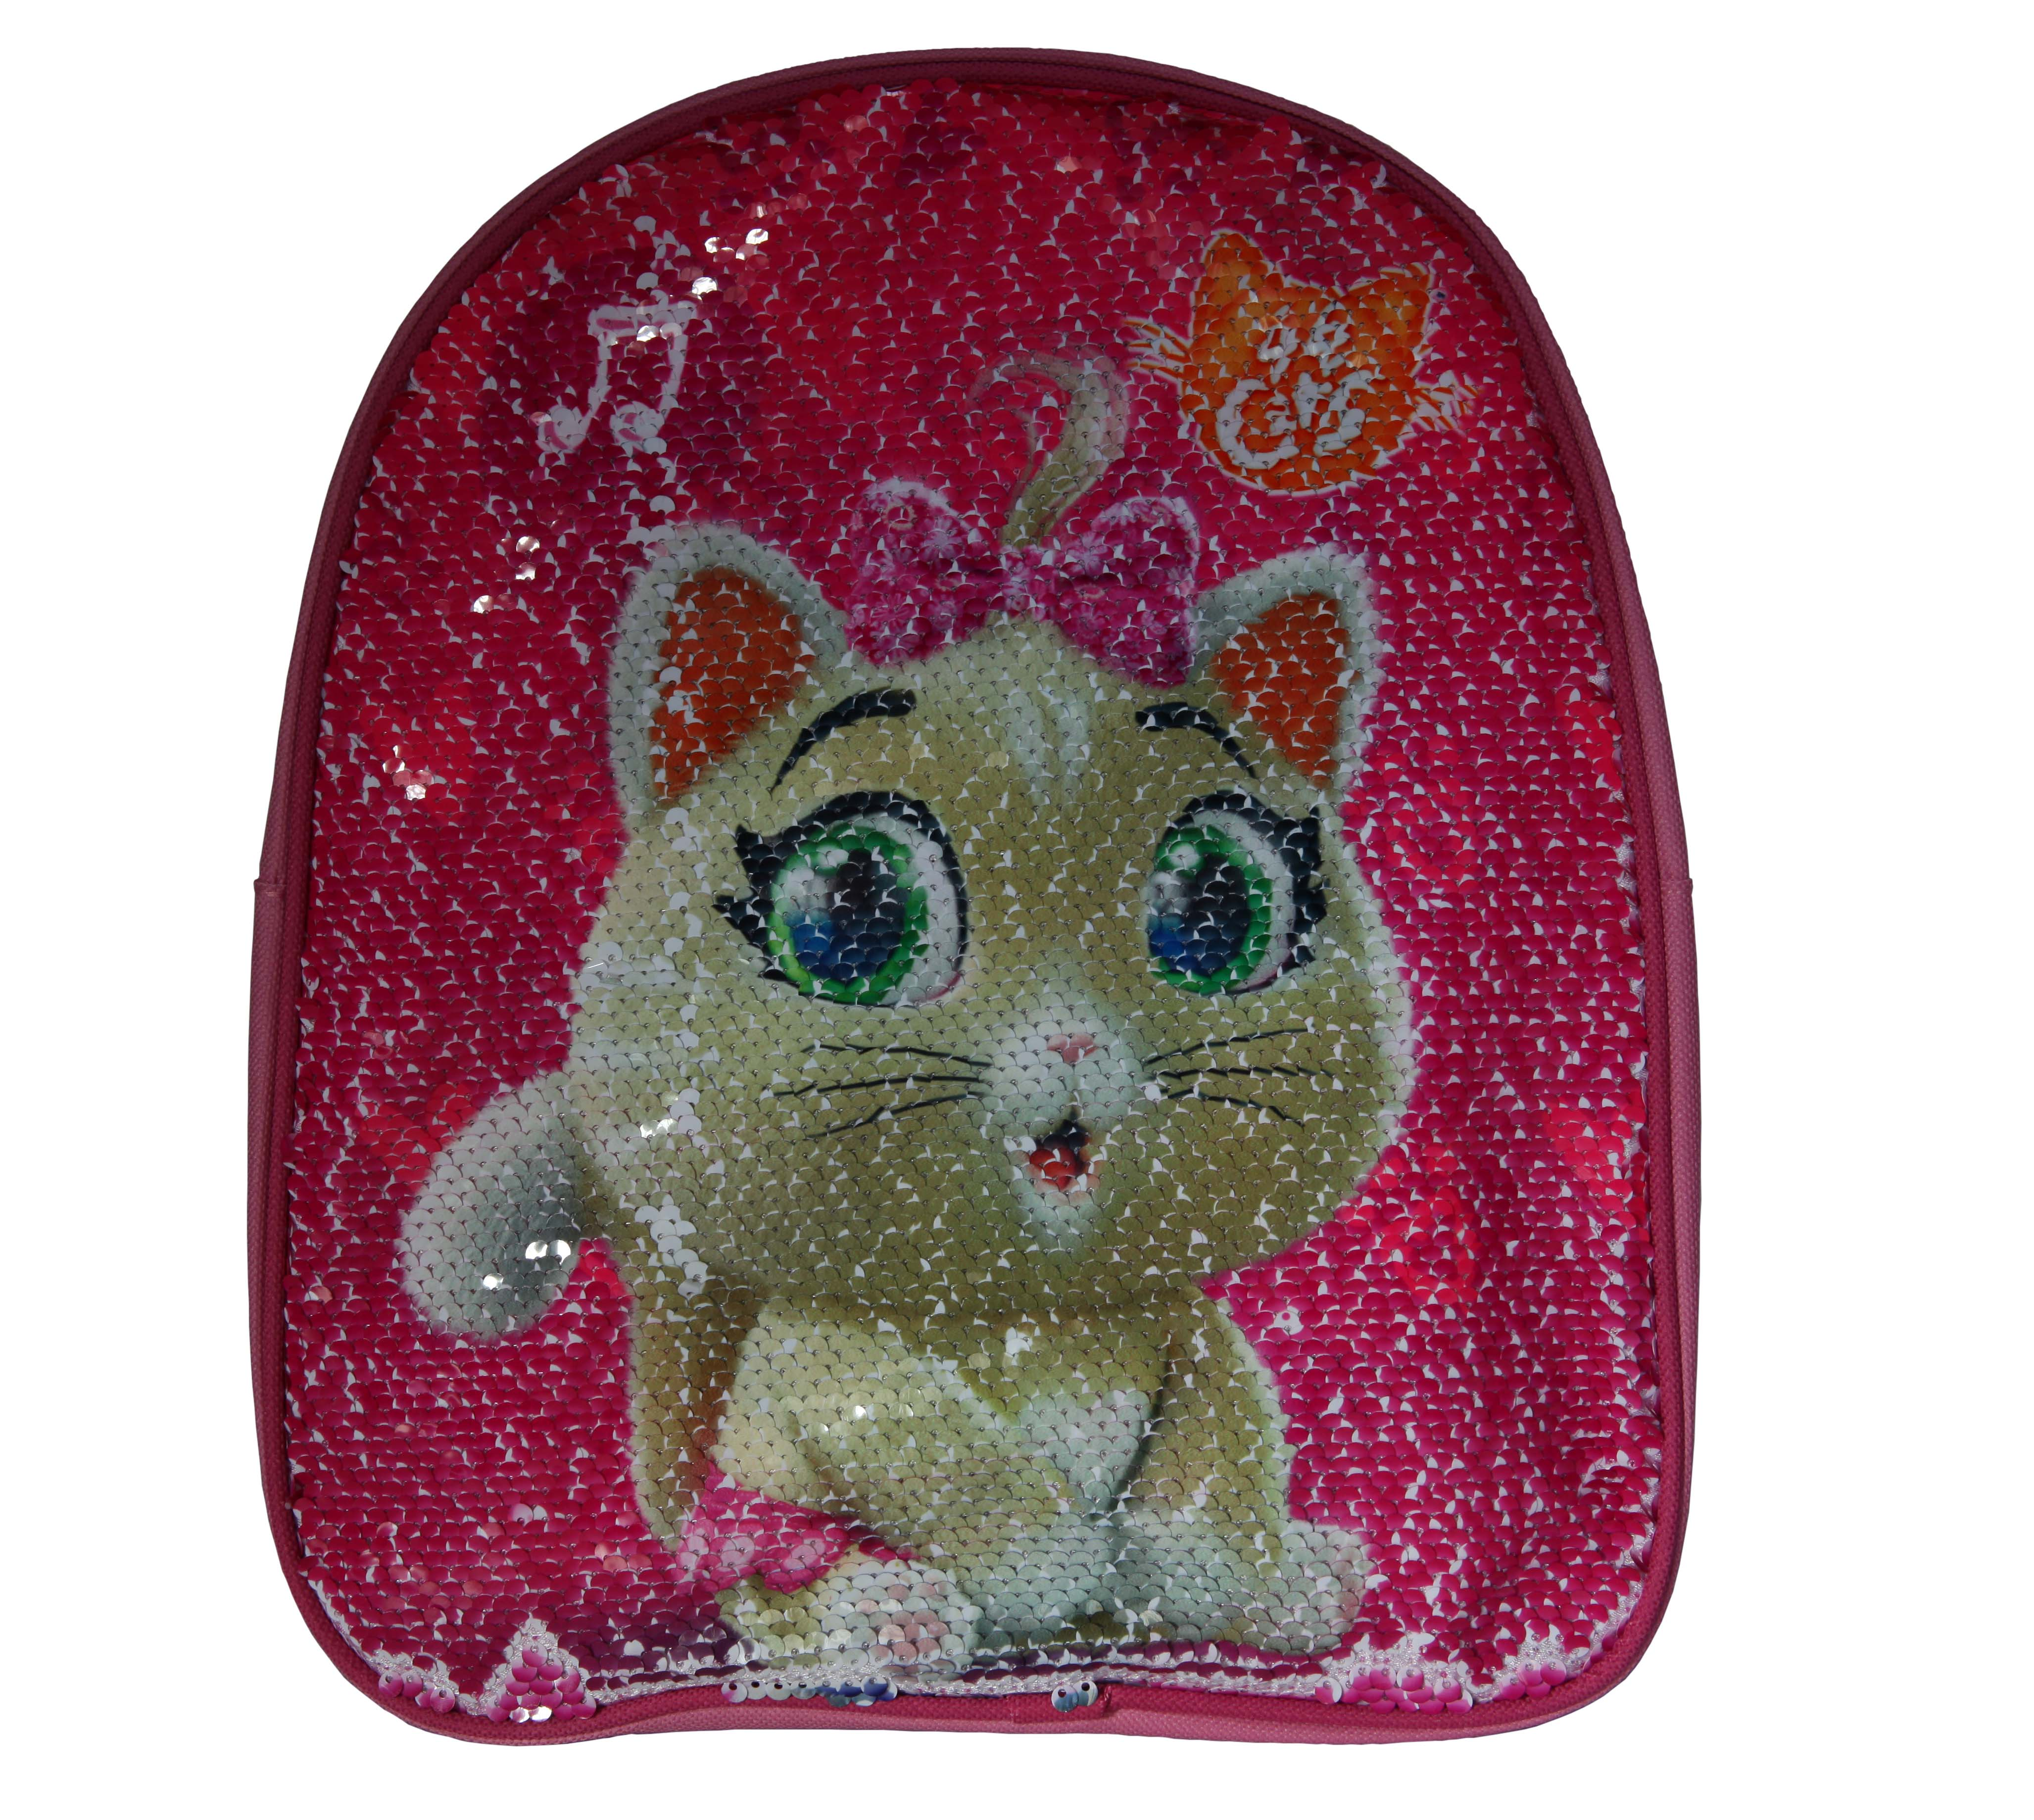 Ghiozdan gradinita cu paiete reversibile 44 Cats, roz 30x26x10 cm0